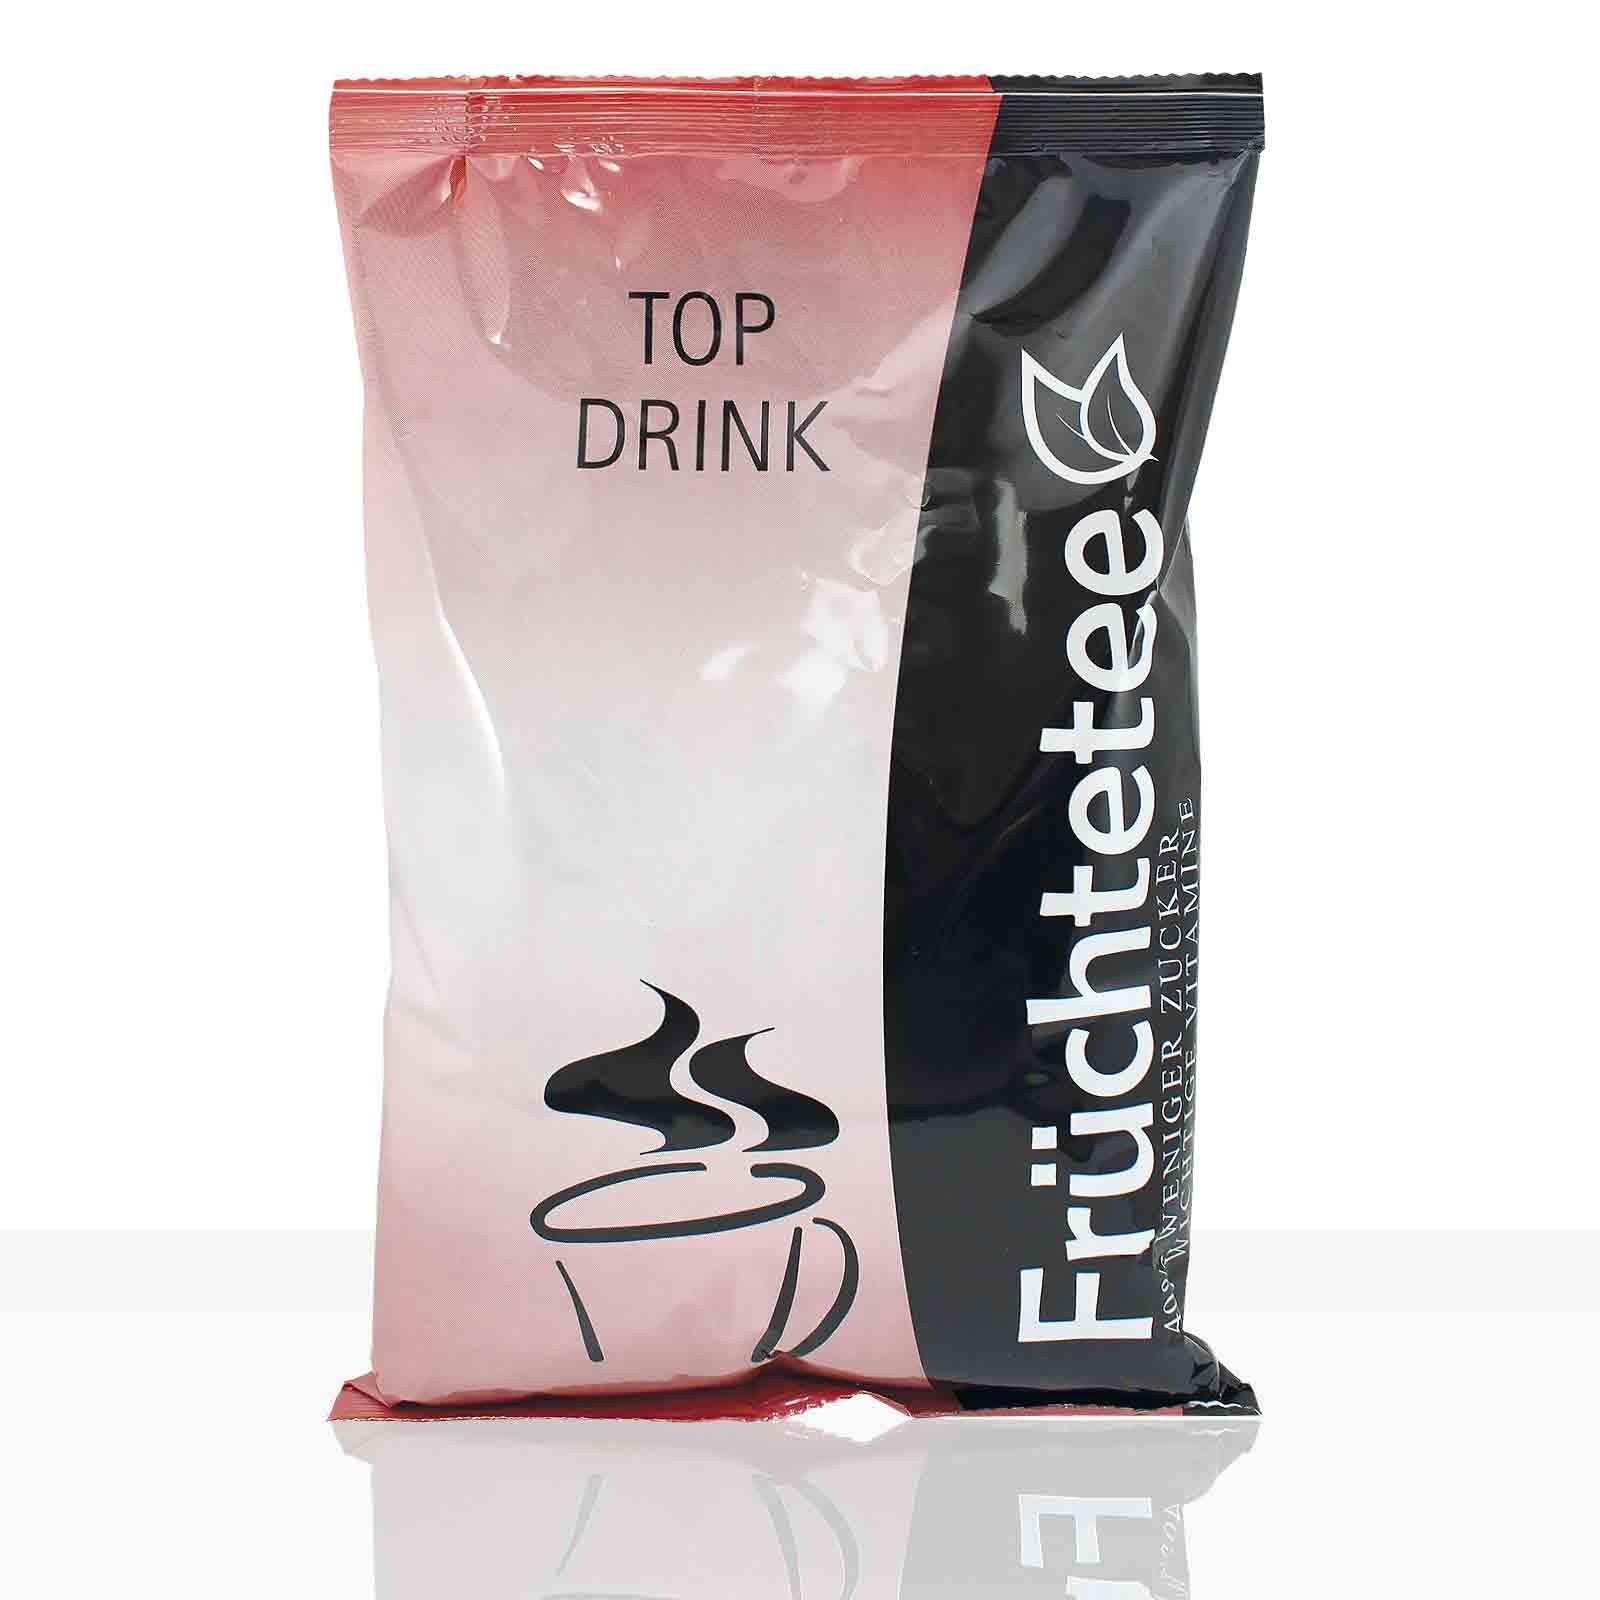 Hämmerle Früchtetee 1kg, Top Drink Instant-Tee